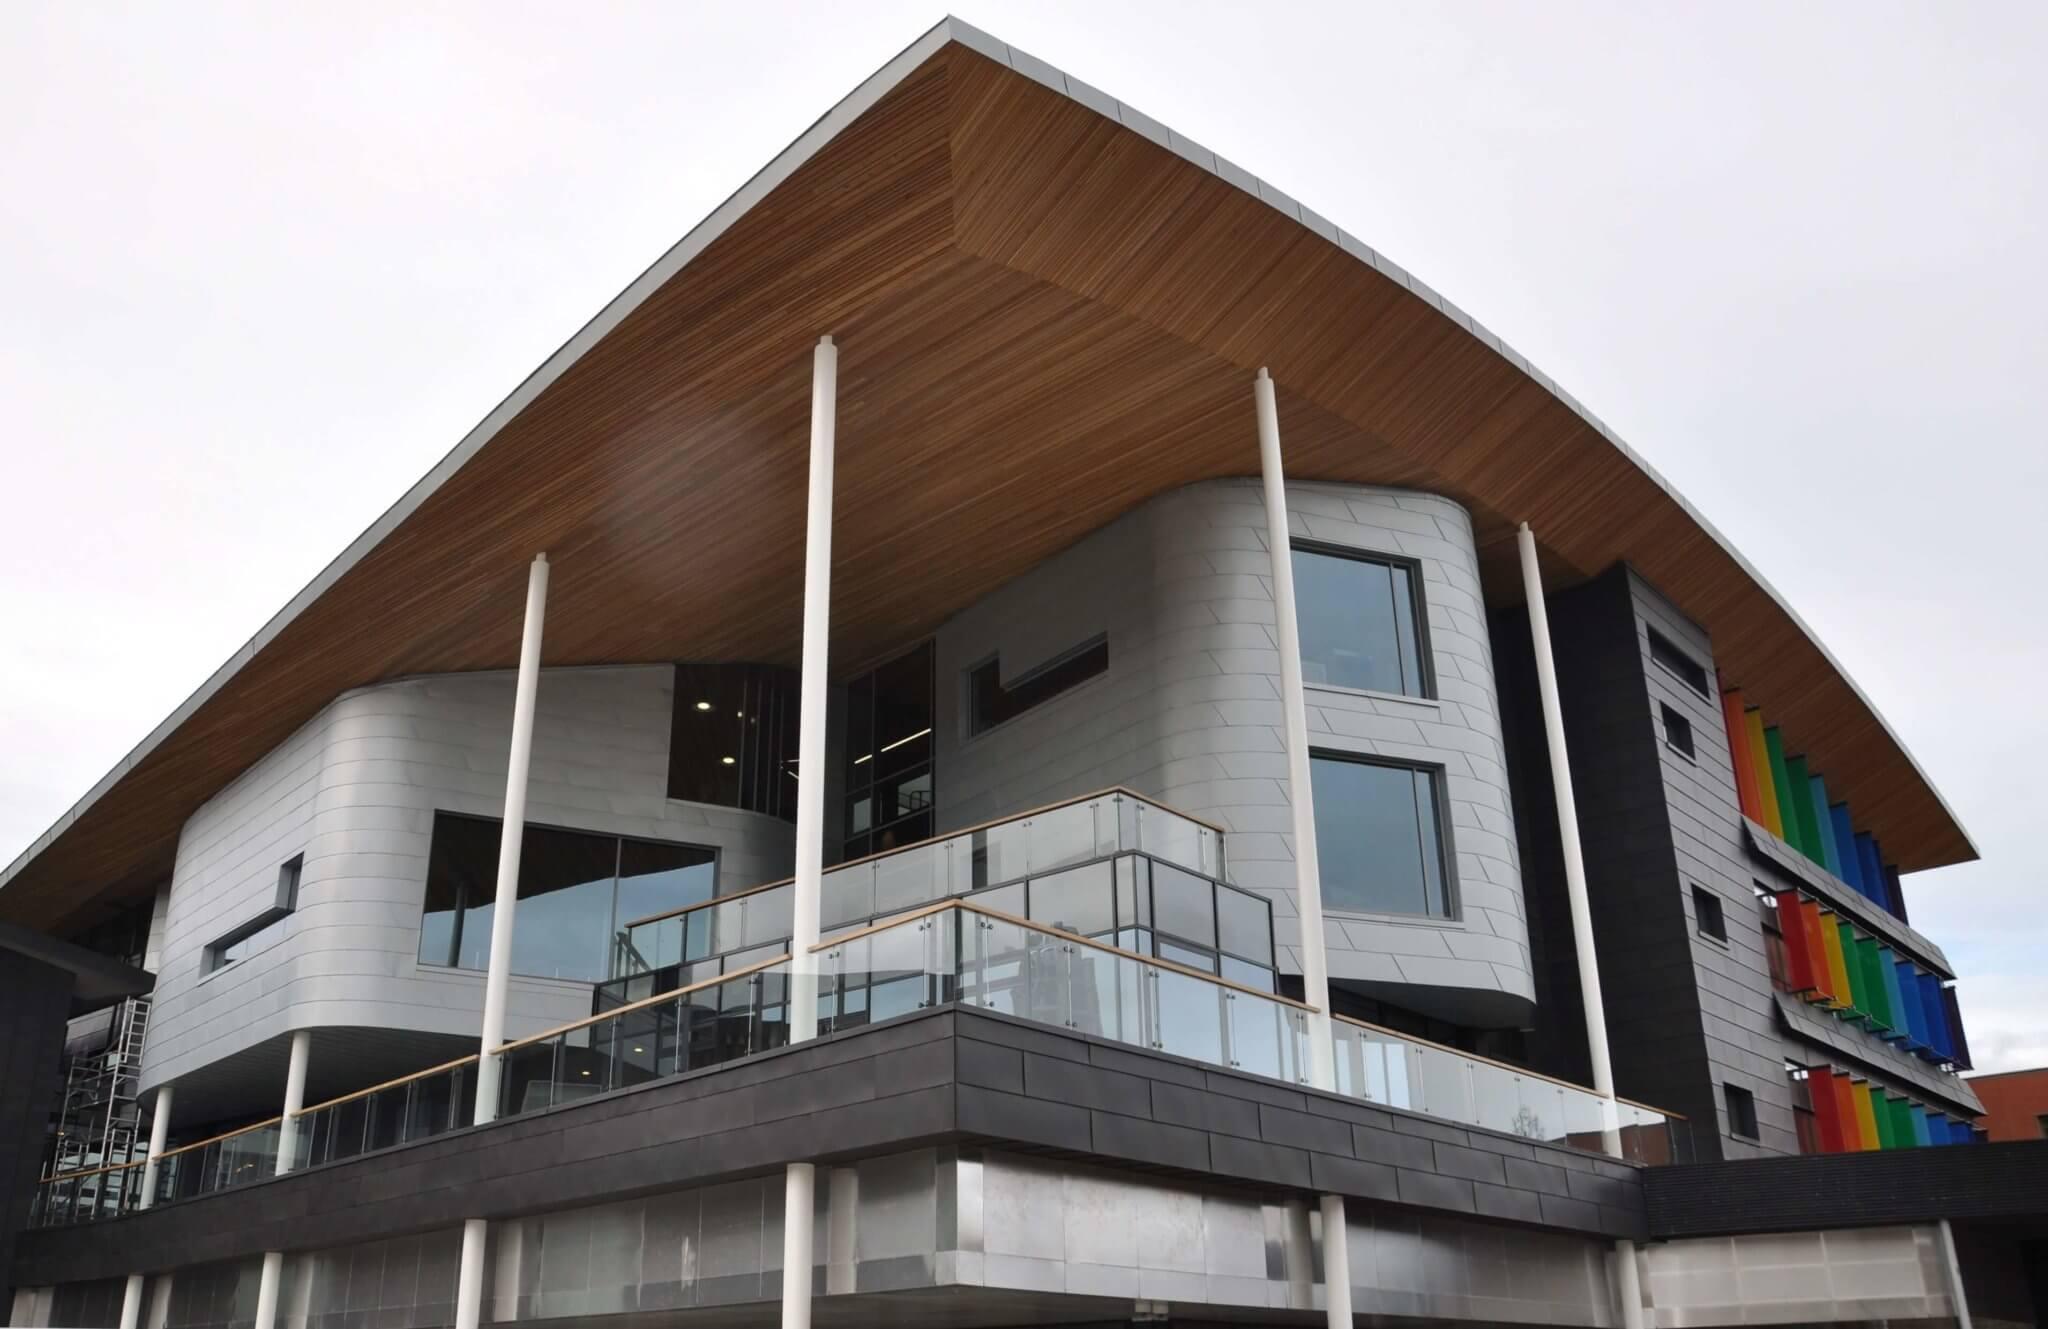 Contour provides HVAC casings for prestigious £26m Cambridge research facility